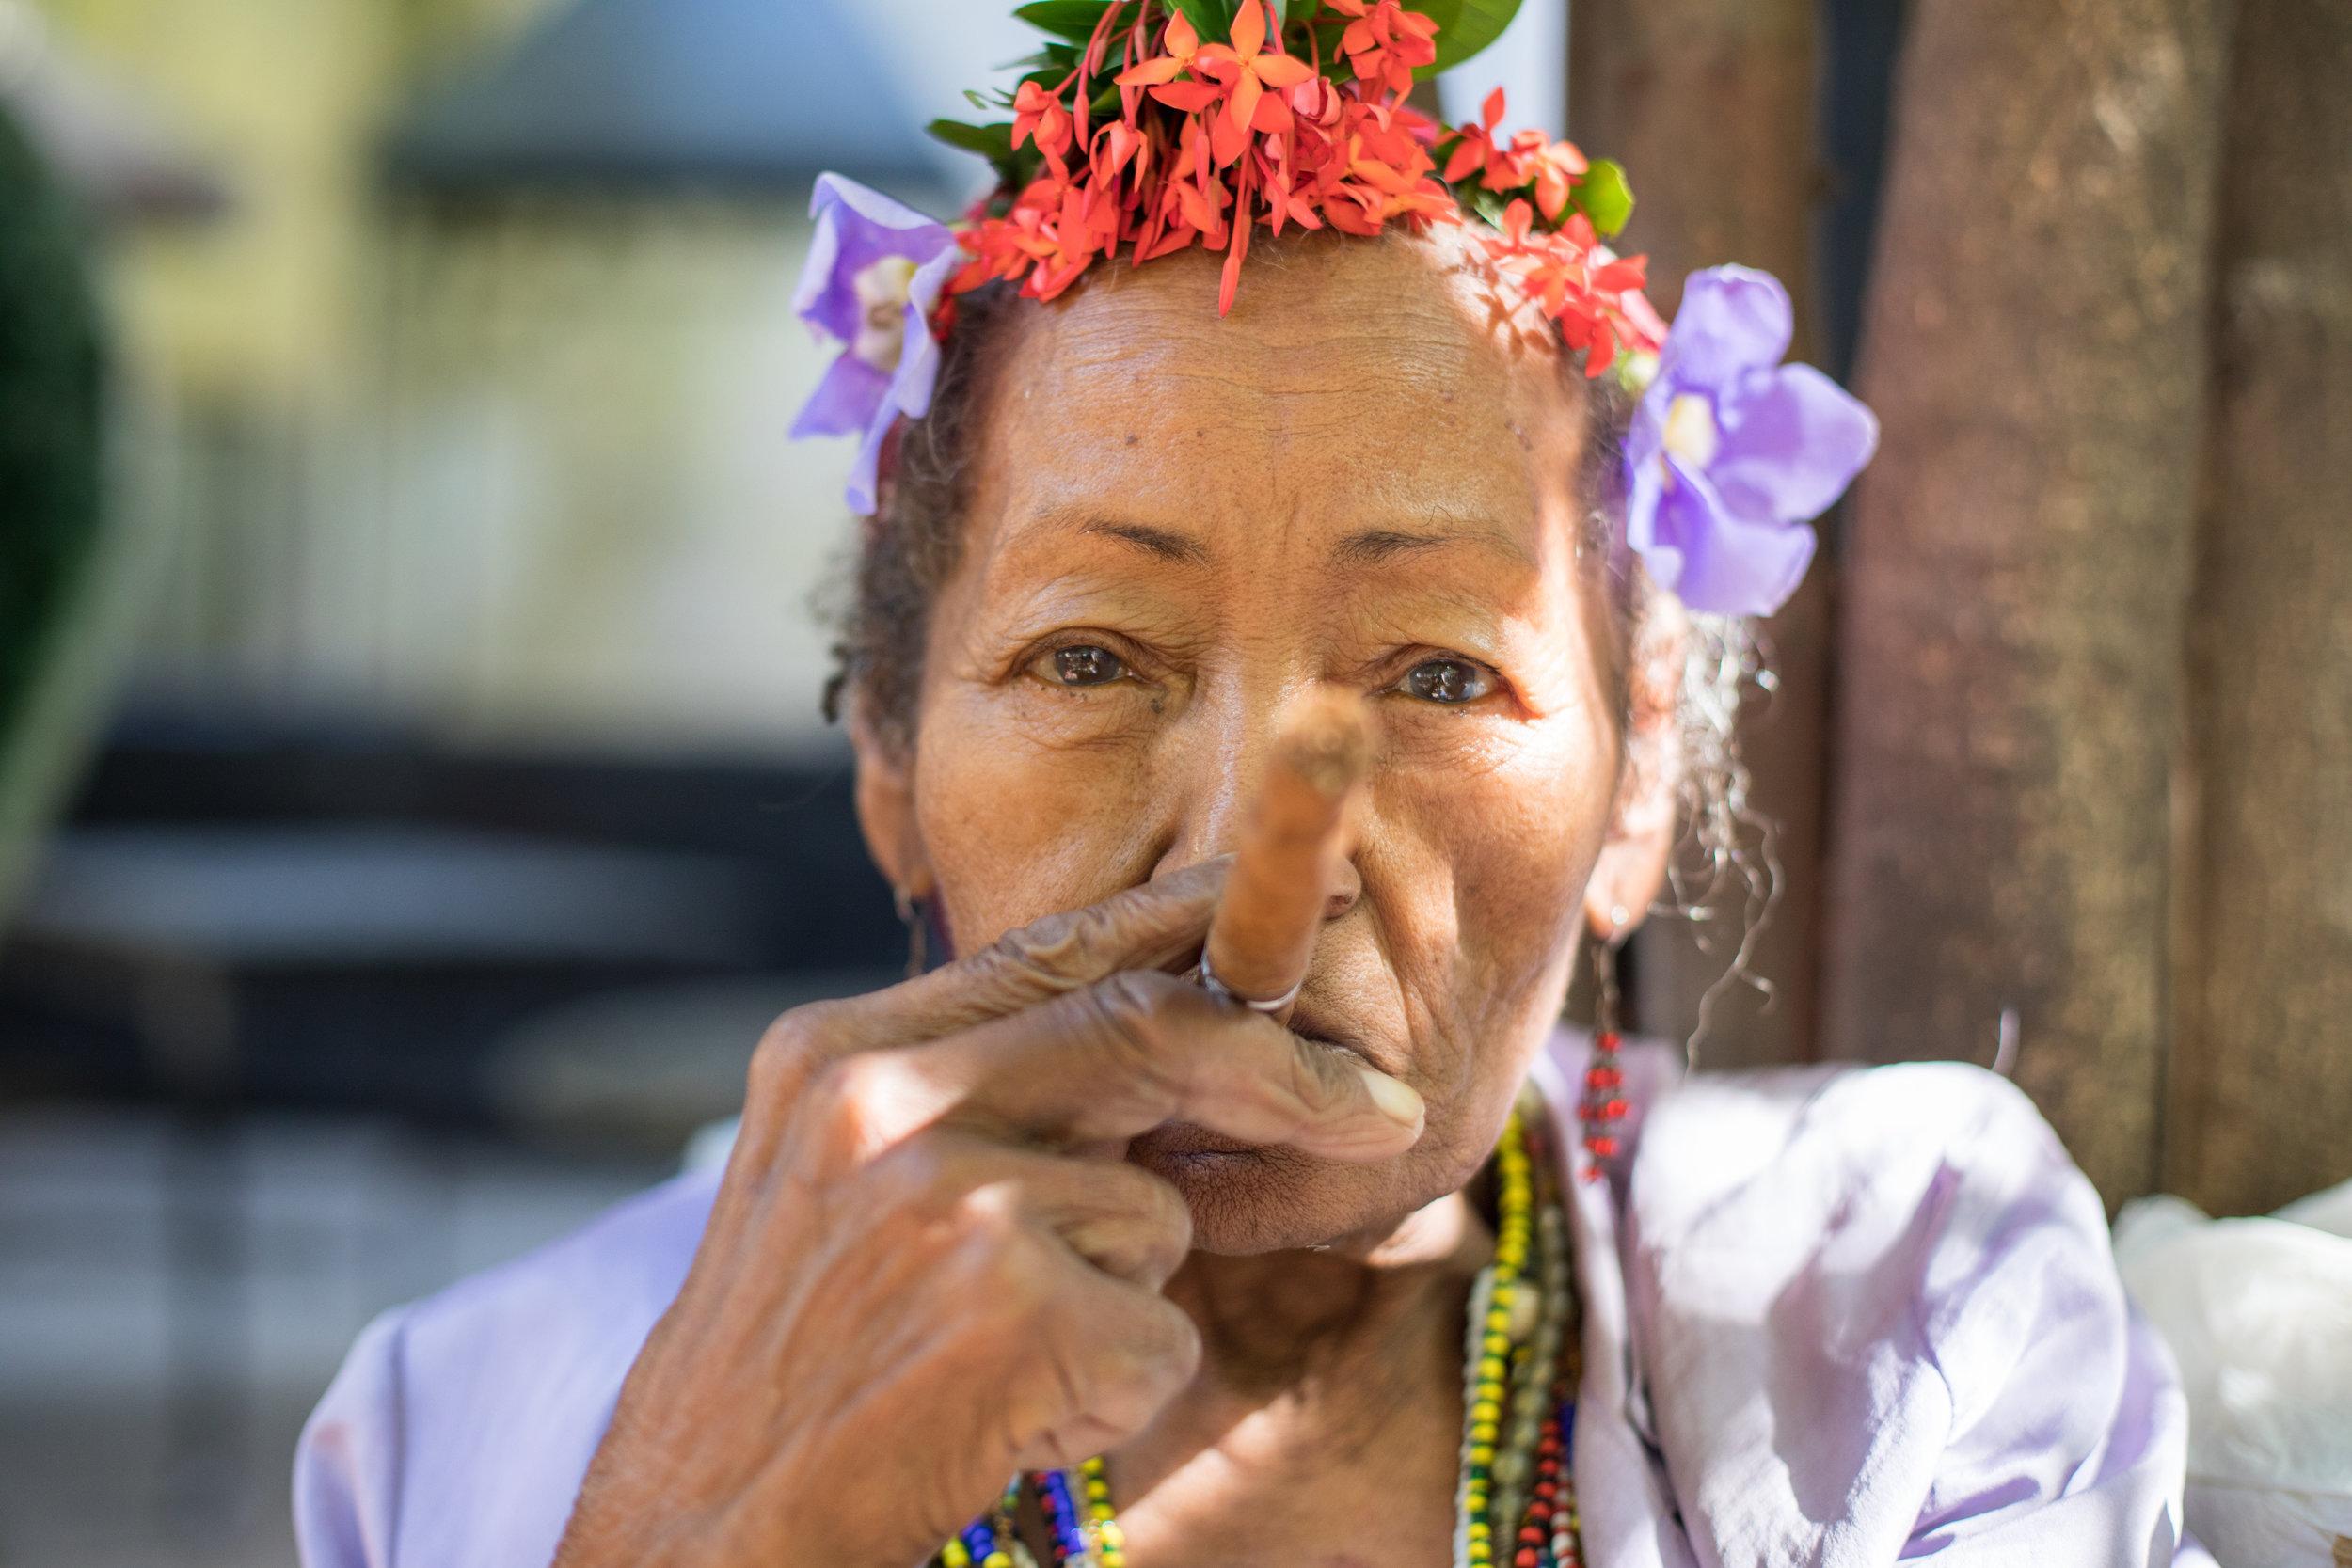 Cuban Portrait by Geraint Rowland Photography.